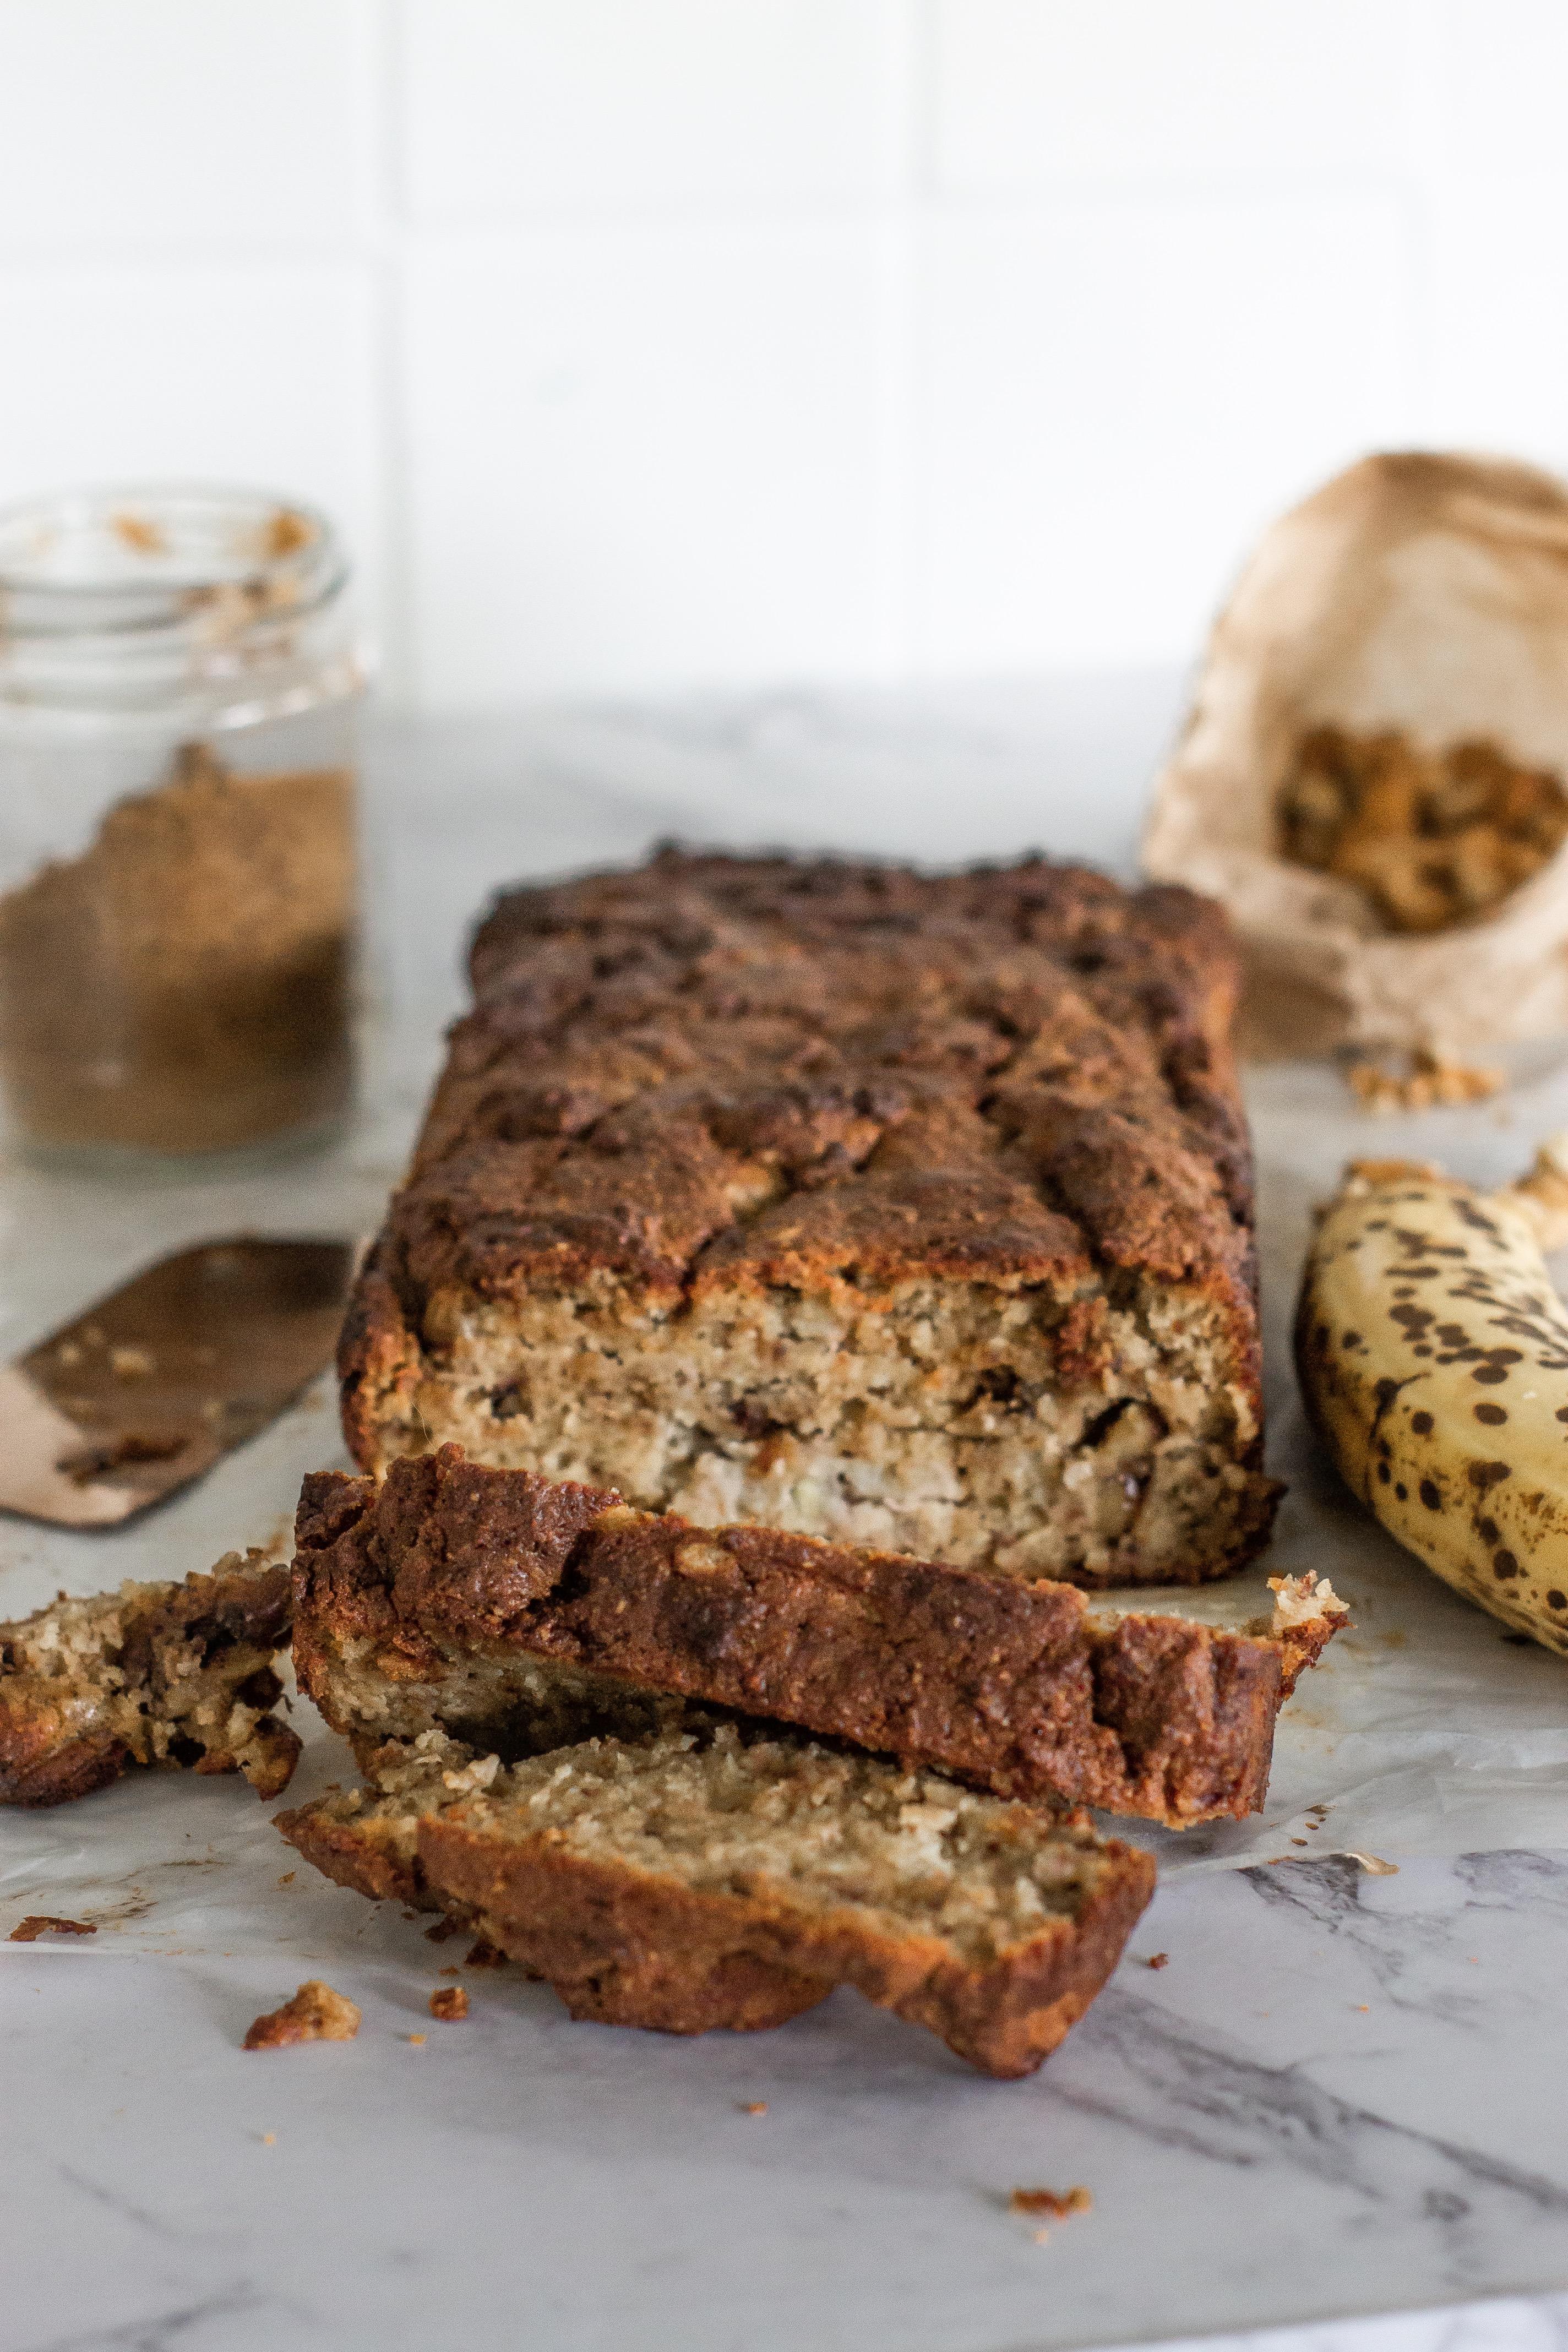 Recipe: Nutty Banana Bread (Paleo, GF, Sugar-Free)